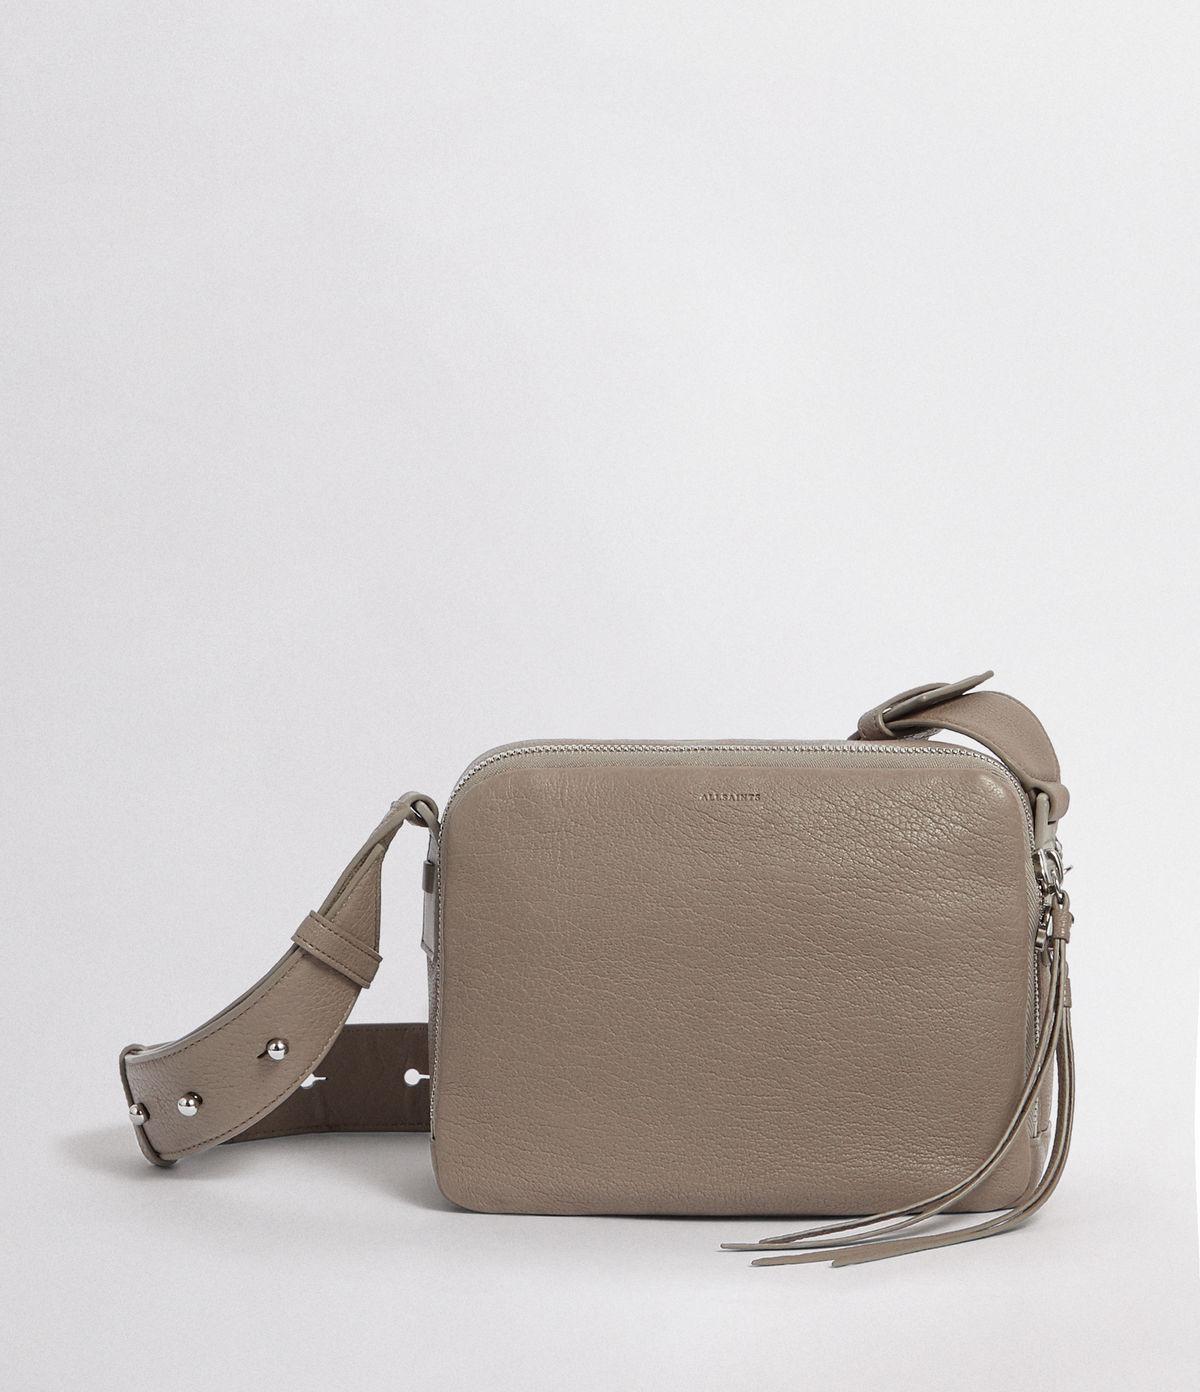 d7d340f02b123 AllSaints Vincent Leather Crossbody Bag in Gray - Lyst